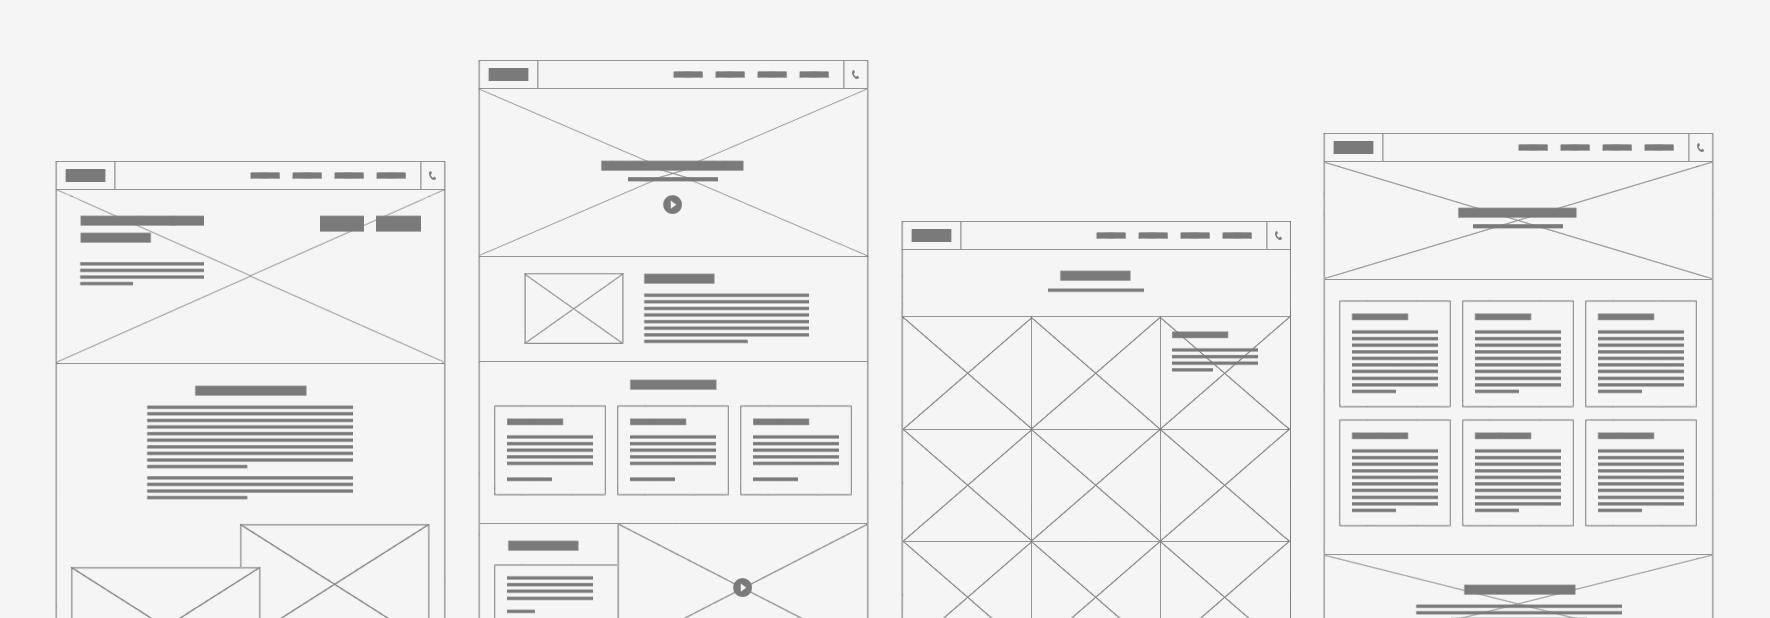 картинки для прототипа сайта